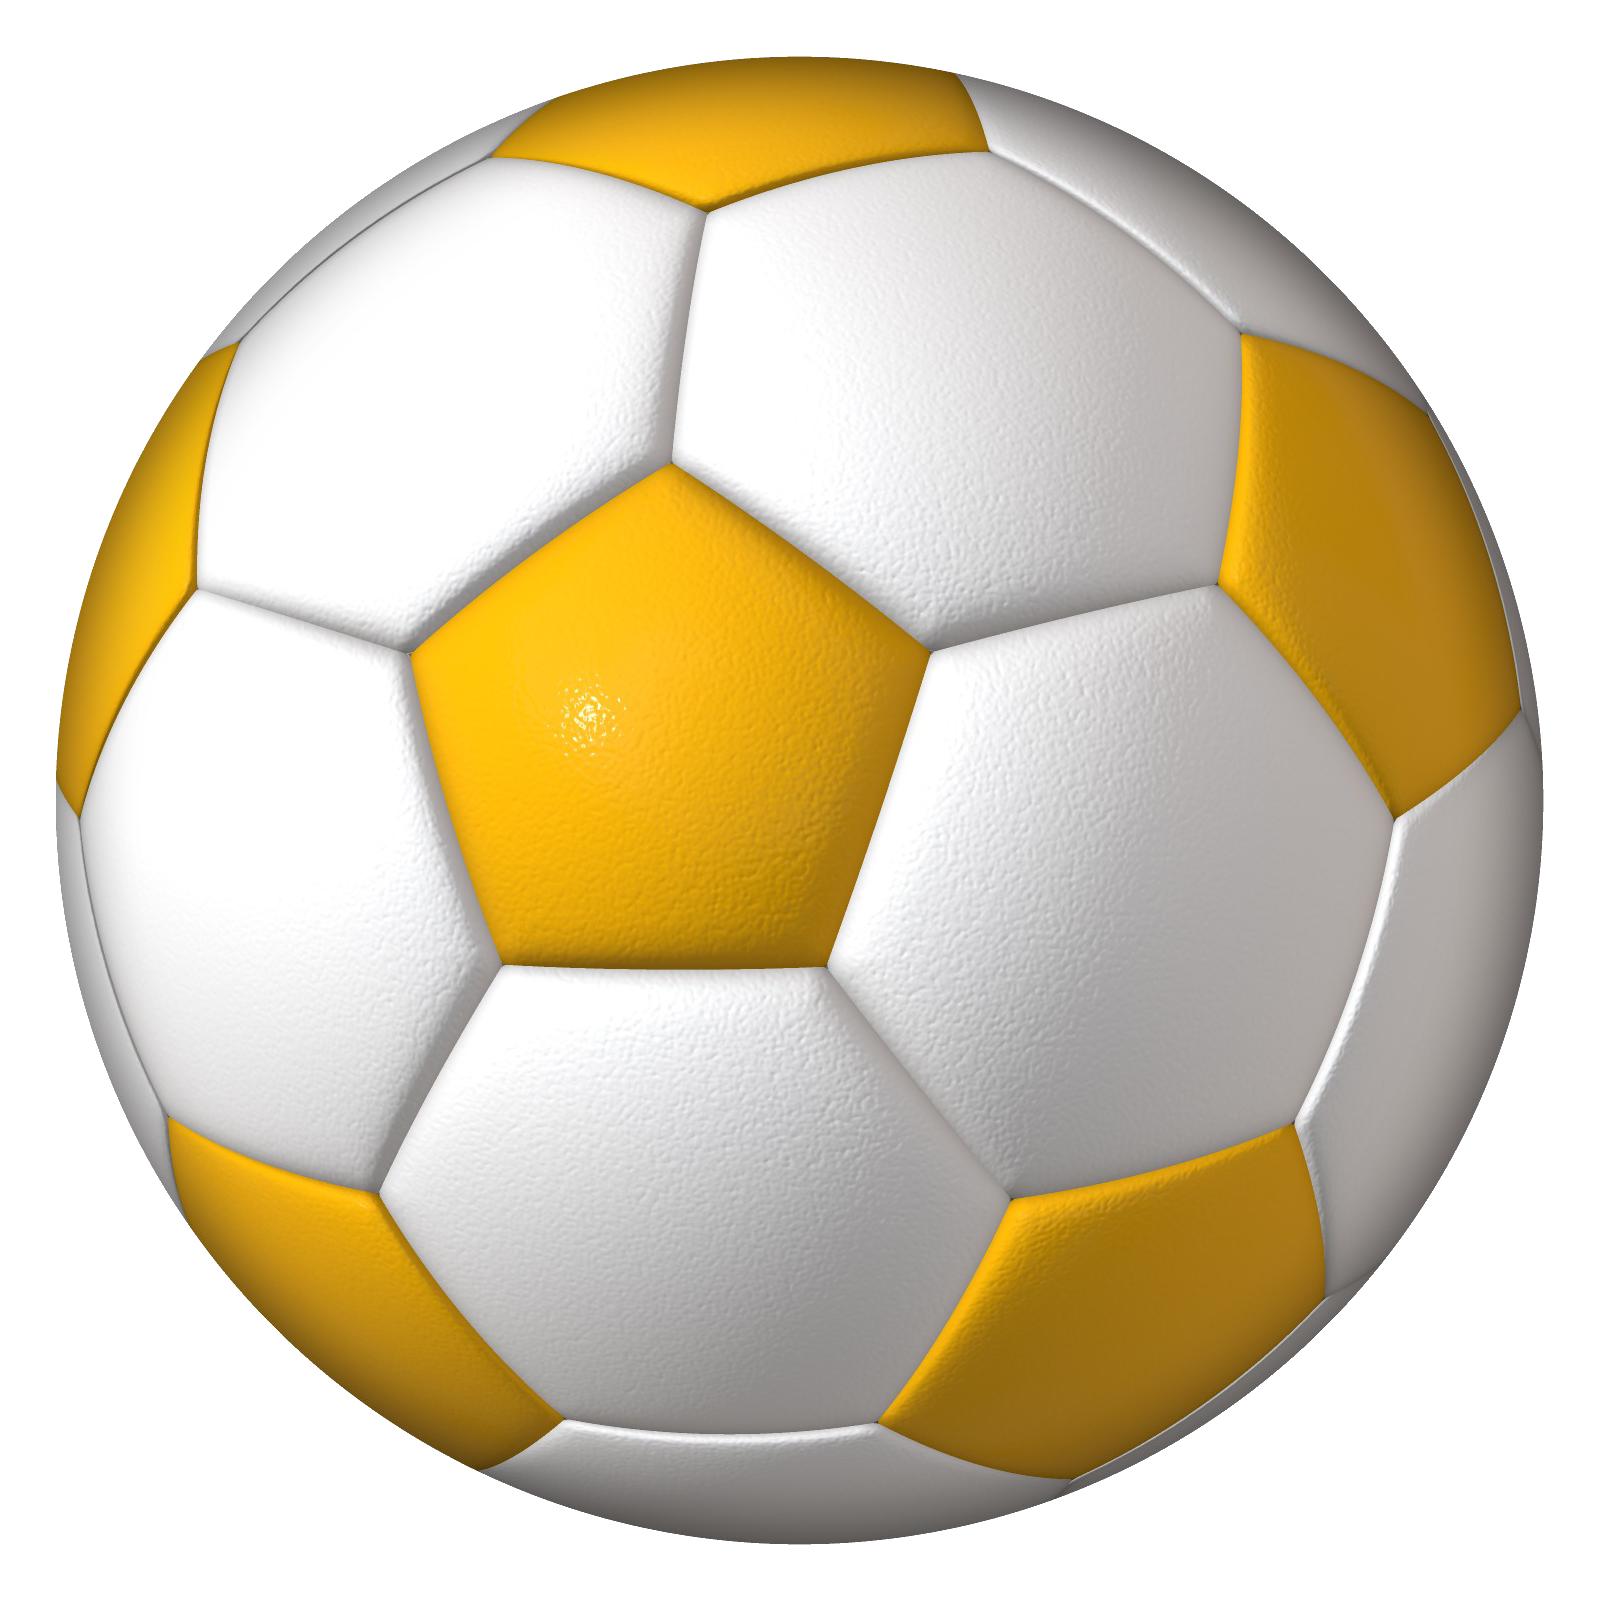 Football PNG Transparent Image - Football PNG